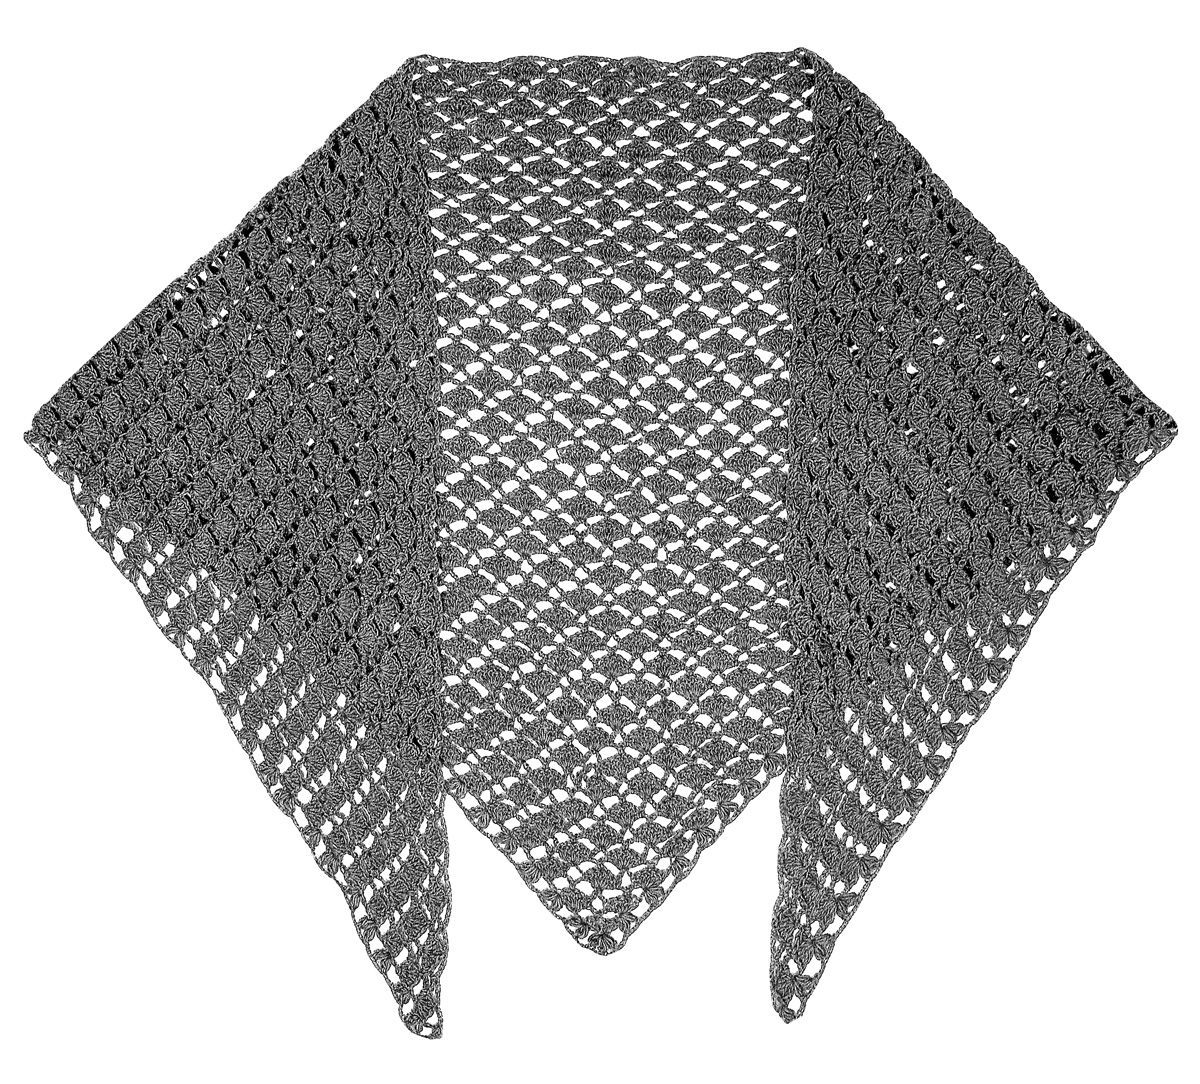 Lana Grossa Wolle Kreativ Fb Ecopuno 25 rotbraun 50 g